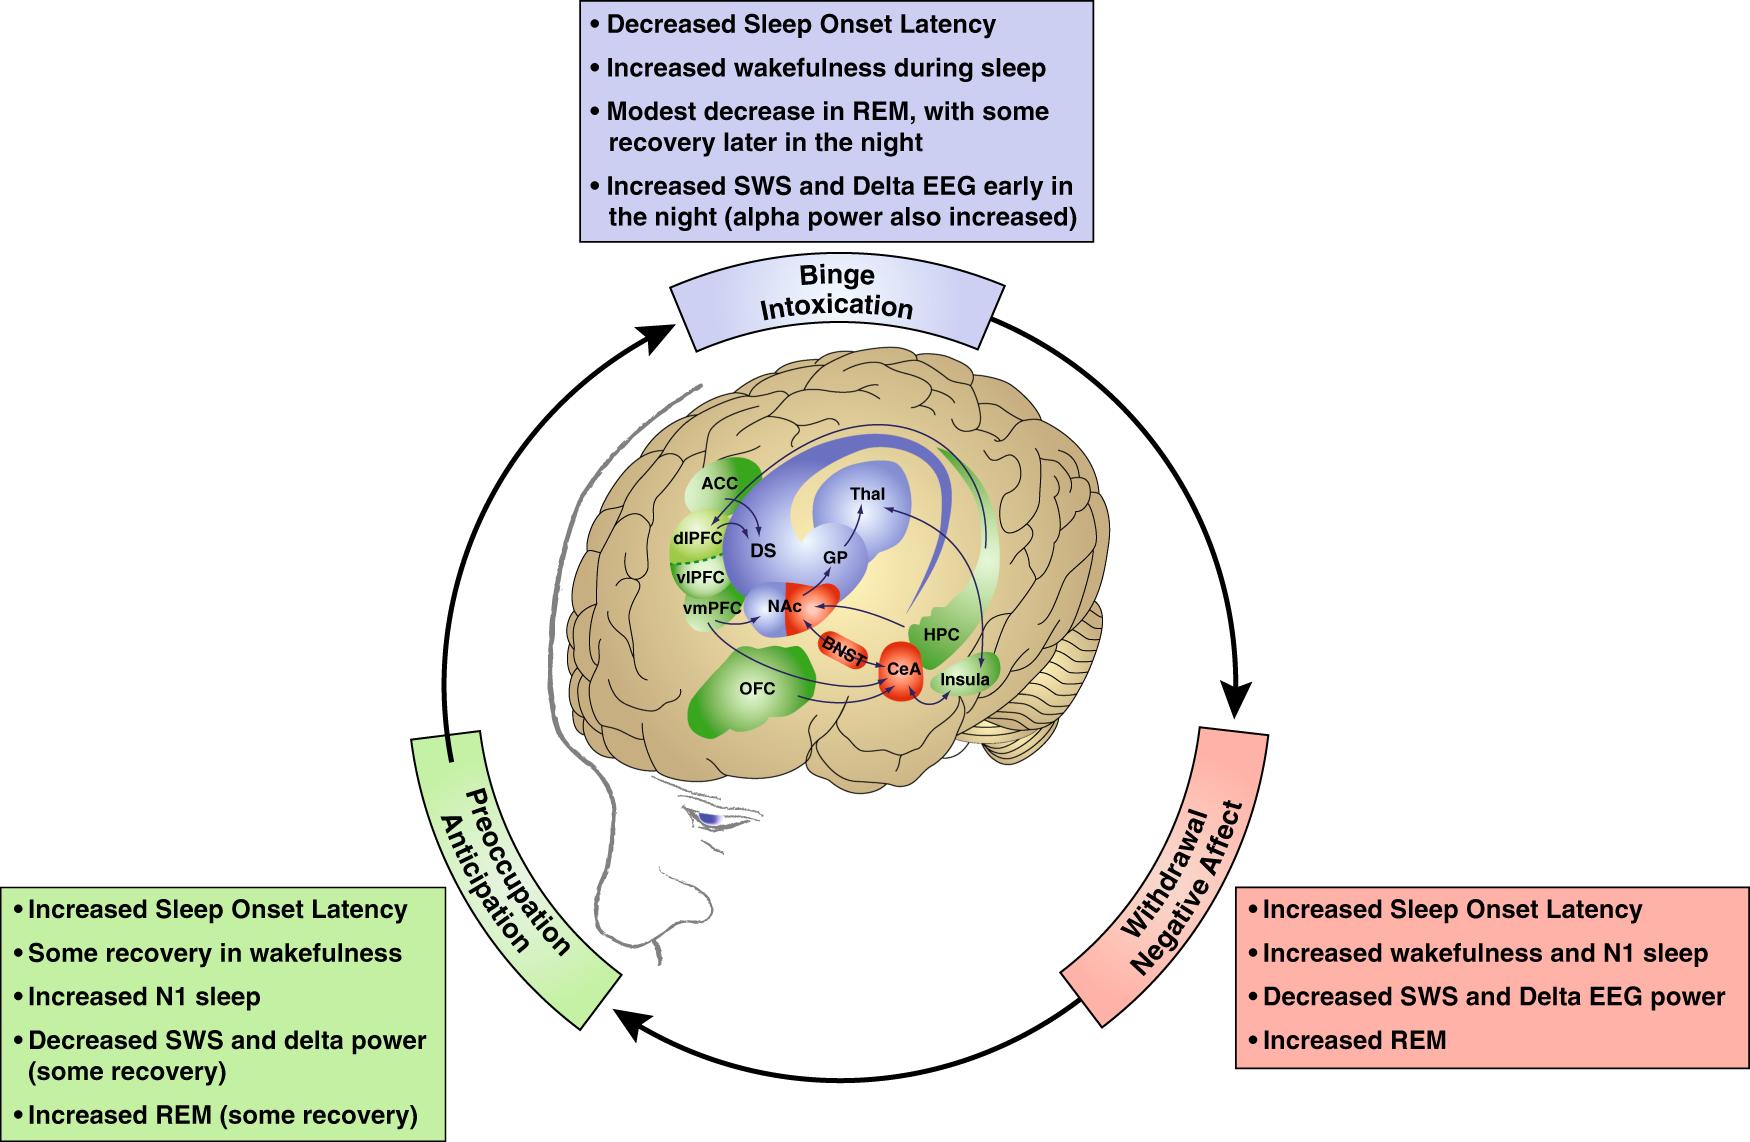 9e86a4e1 Alcohol use disorder and sleep disturbances: a feed-forward allostatic  framework | Neuropsychopharmacology